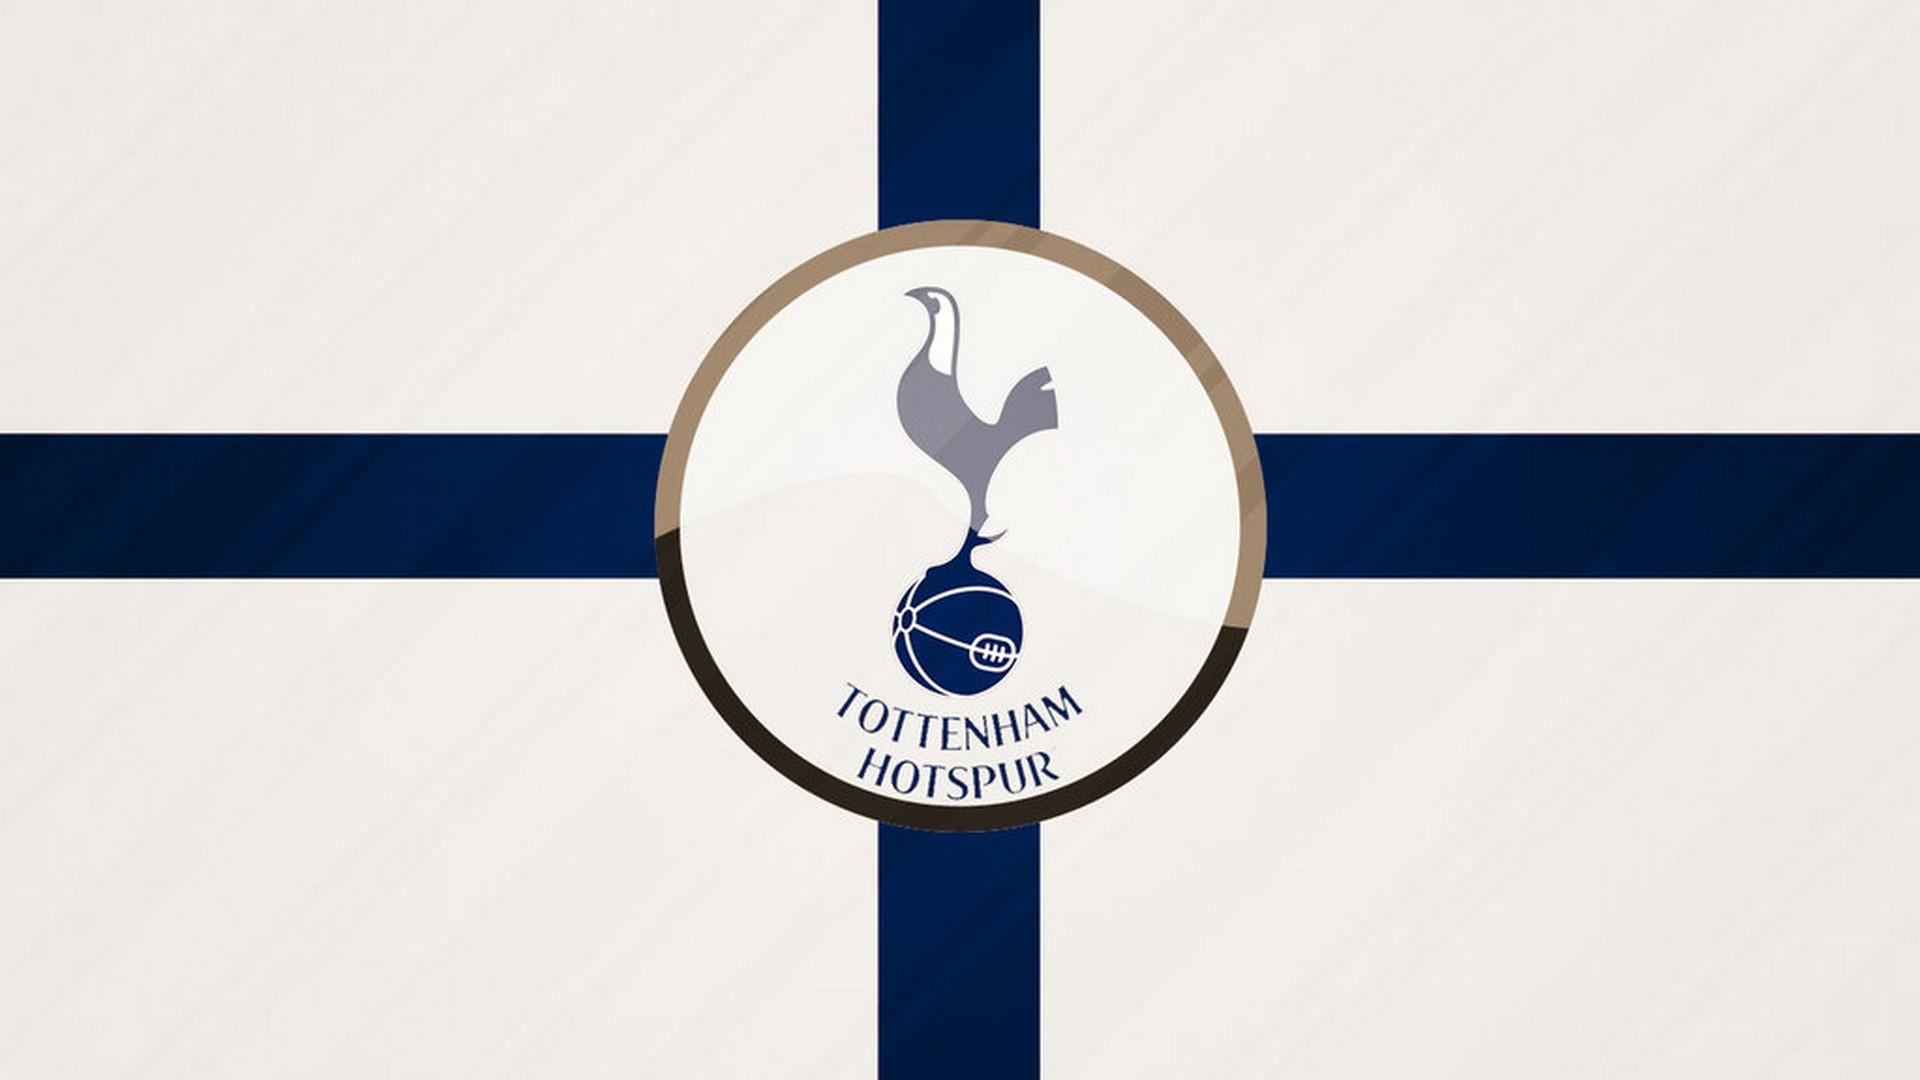 Tottenham Hotspurs Wallpaper Posted By Ryan Mercado